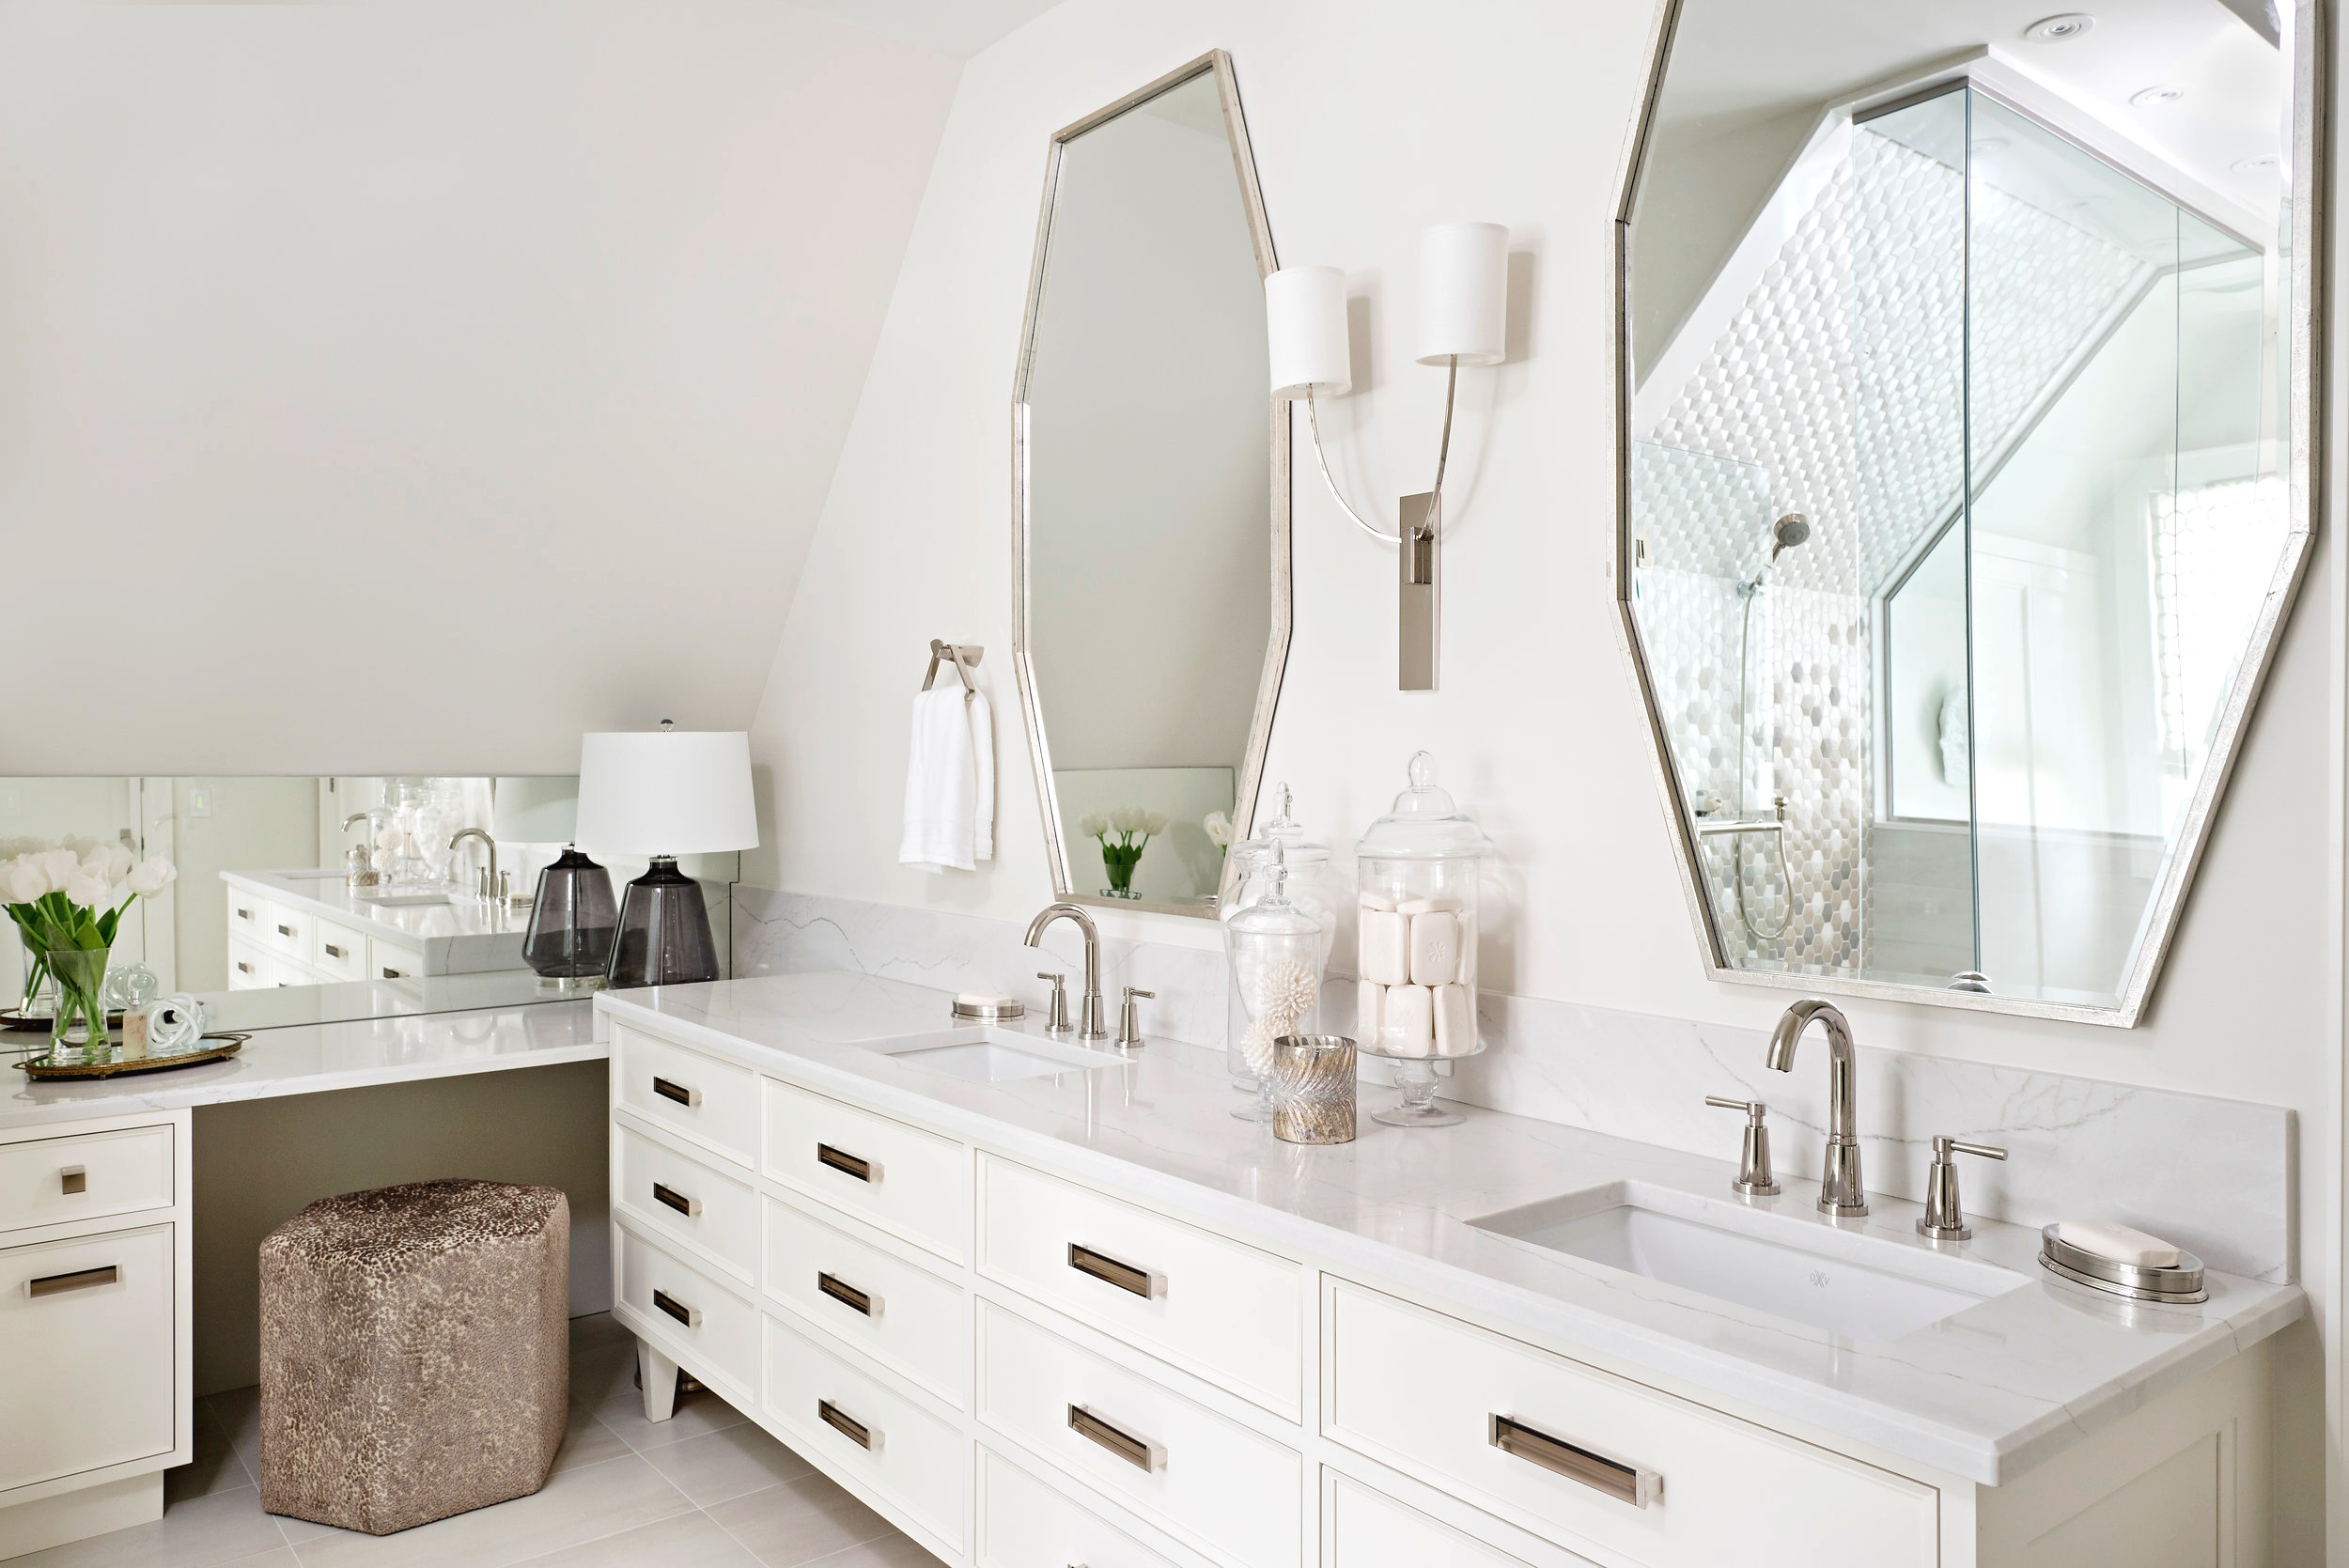 Interior Designer Pizzale Design Dual sink vanity Custom Mirror Marble Countertop Rectangle Pulls Light Airy Bathroom.jpg